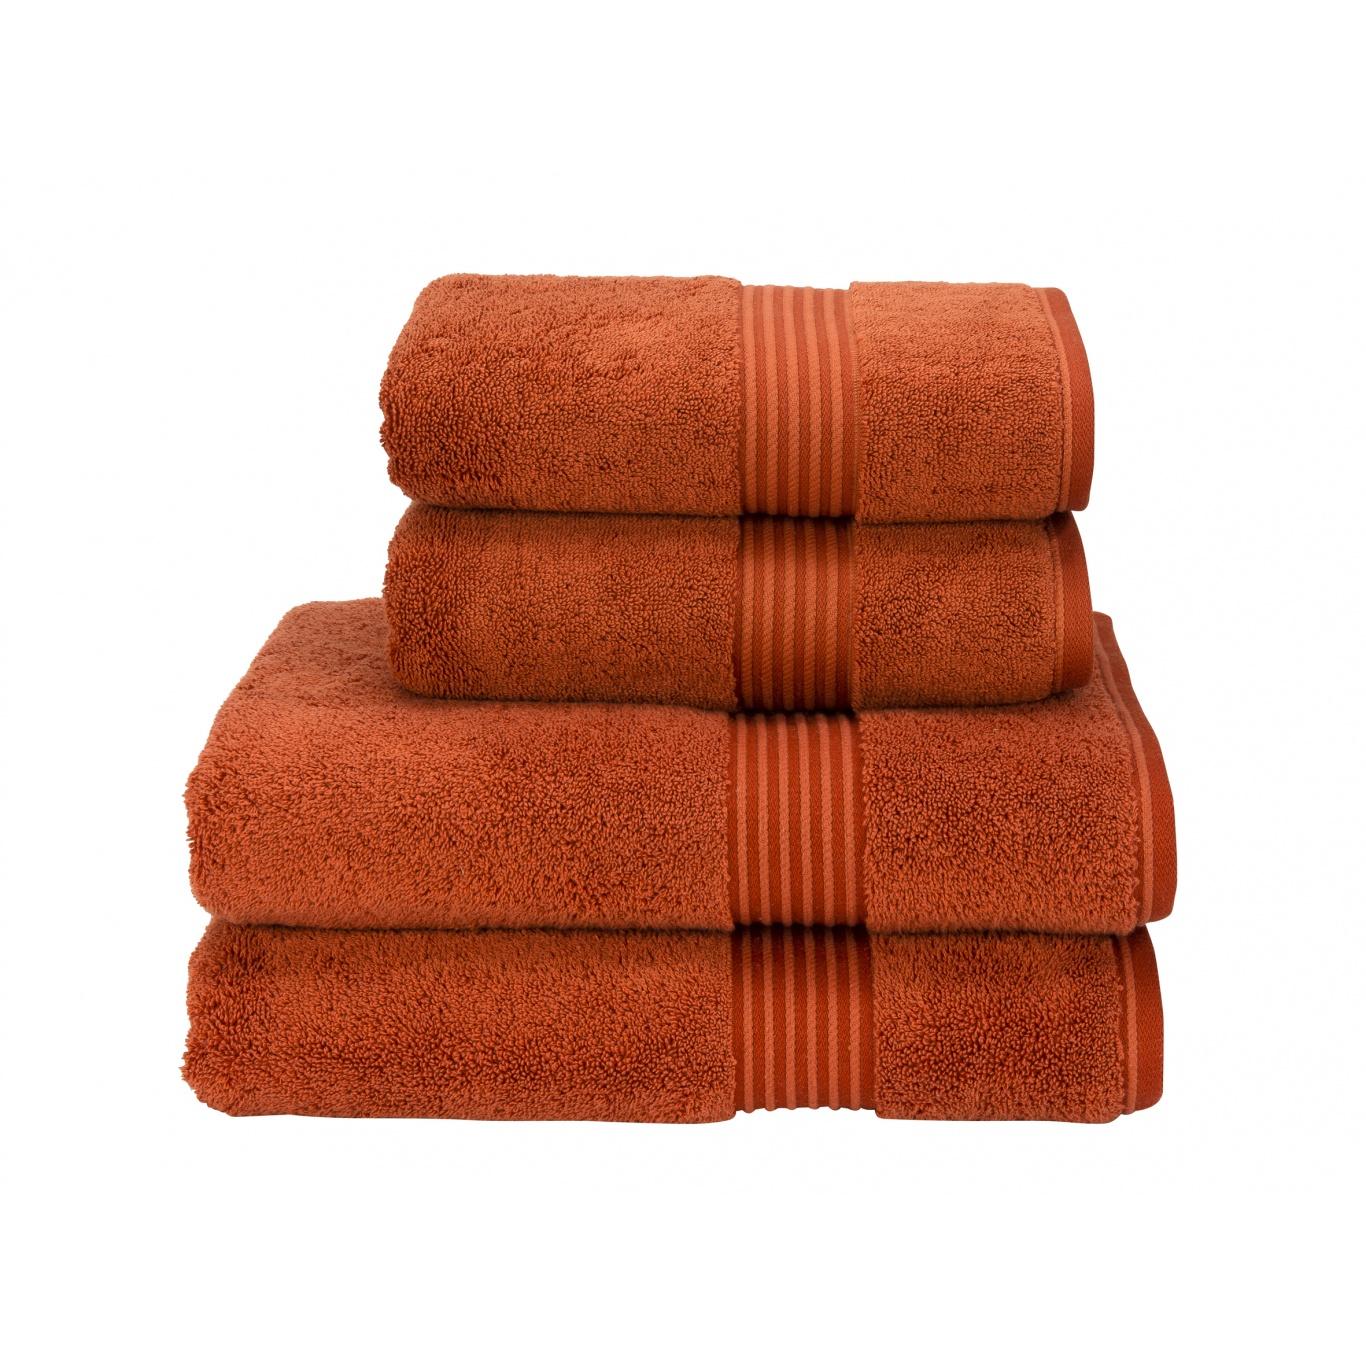 Image of Christy Supreme Supima Hygro Paprika Towels